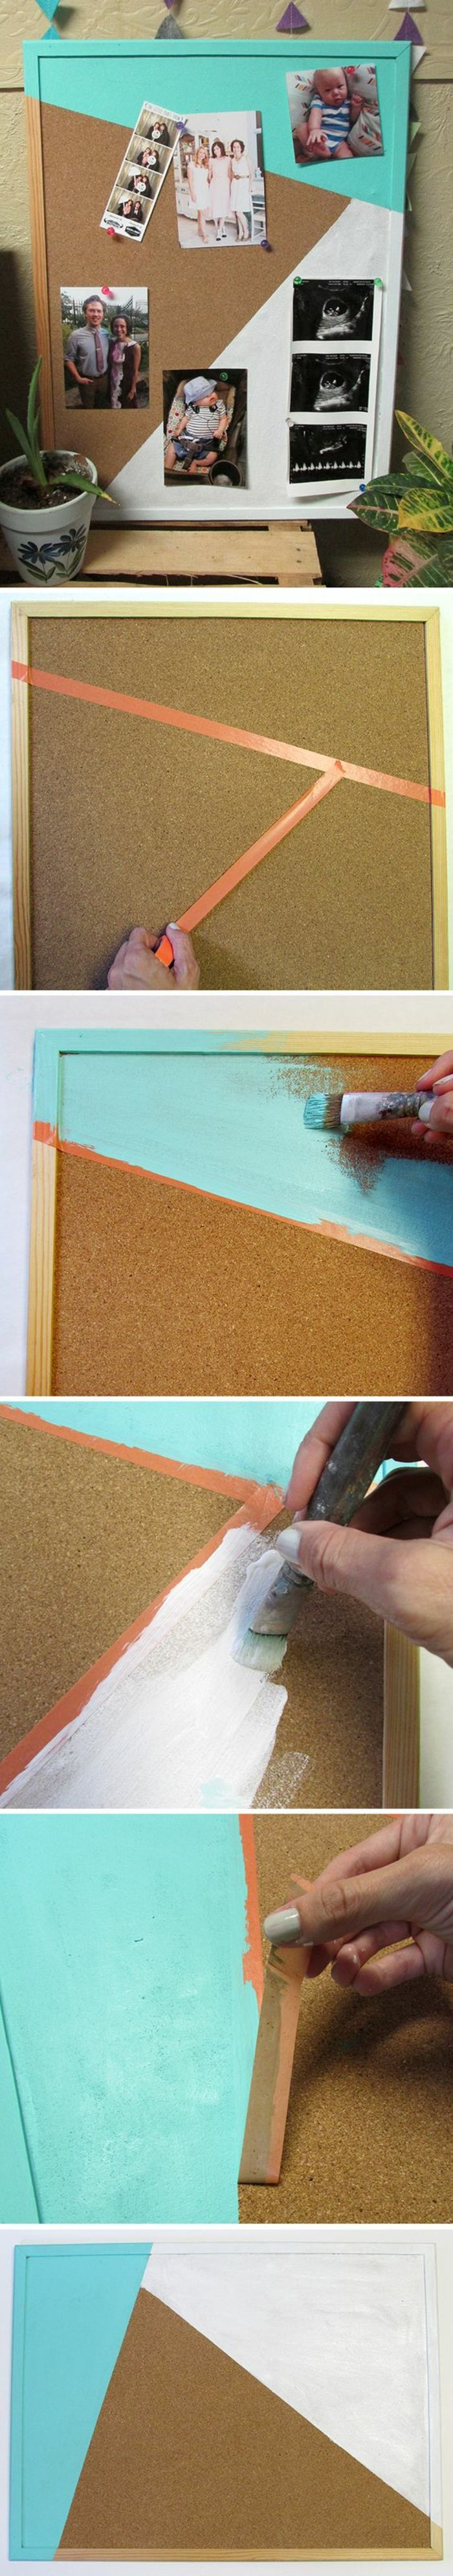 pinnwand aus kork färben, klebeband, blaue farbe, fotos